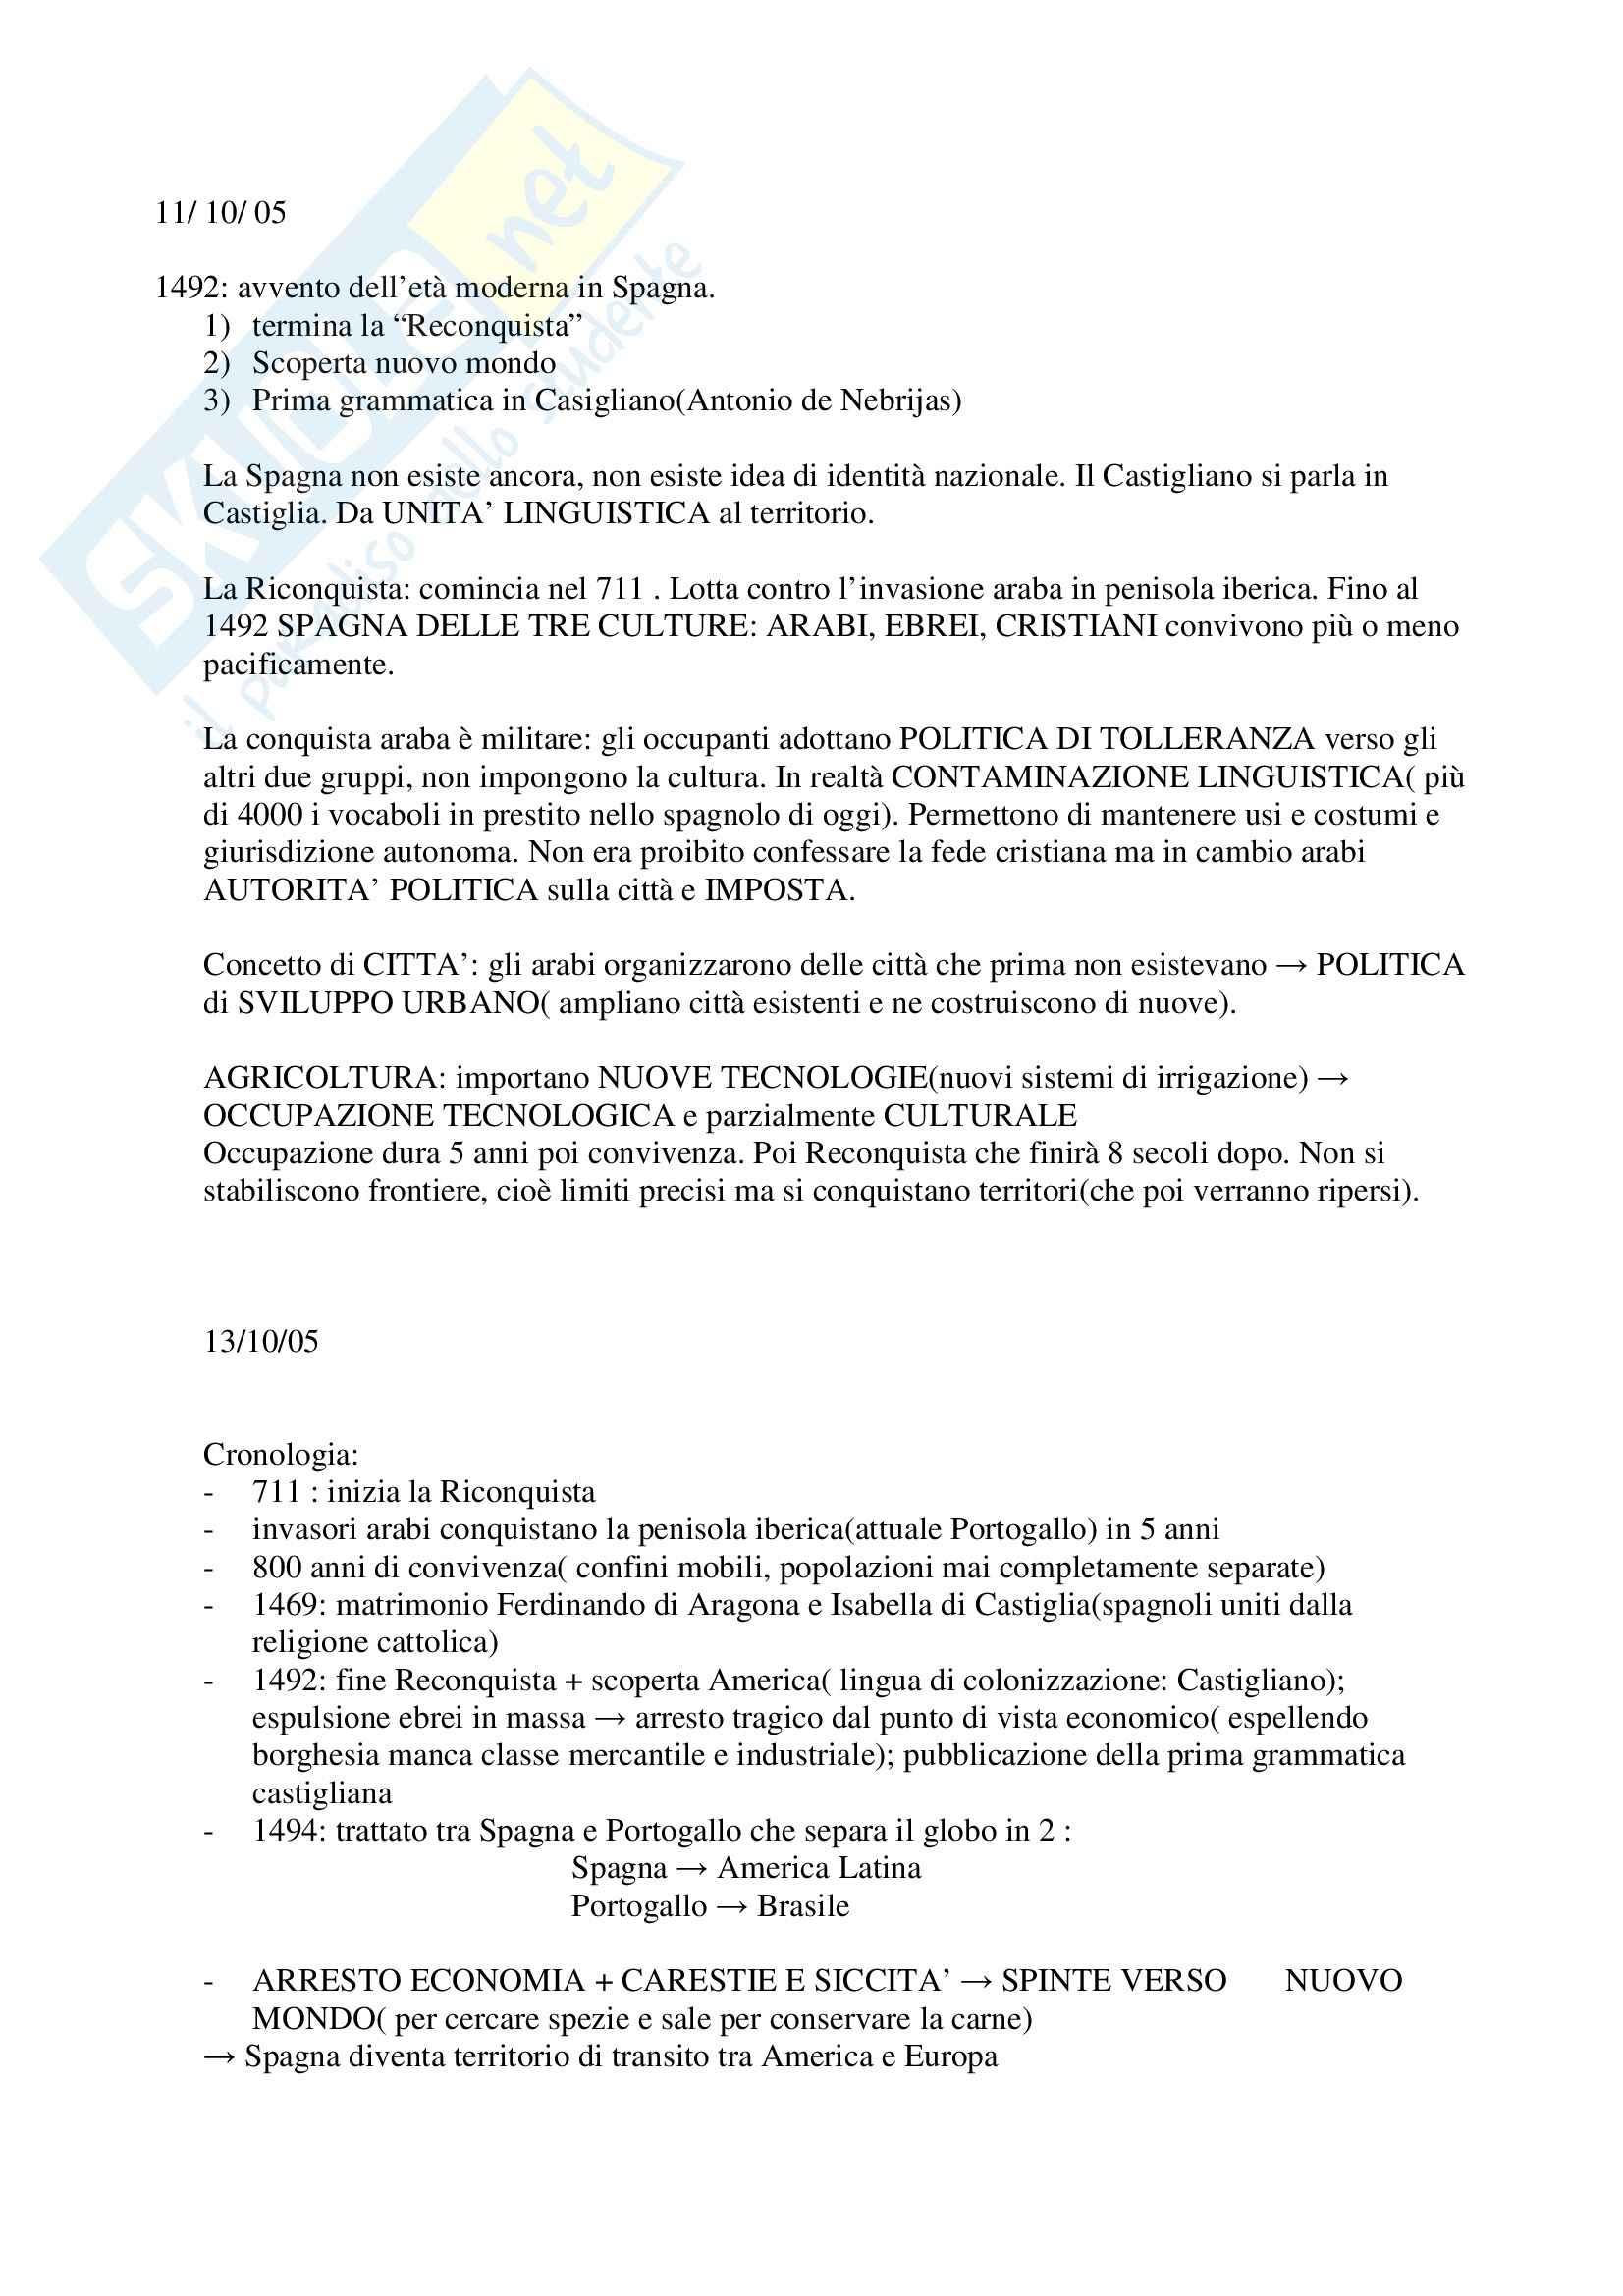 Letteratura spagnola - appunti generici